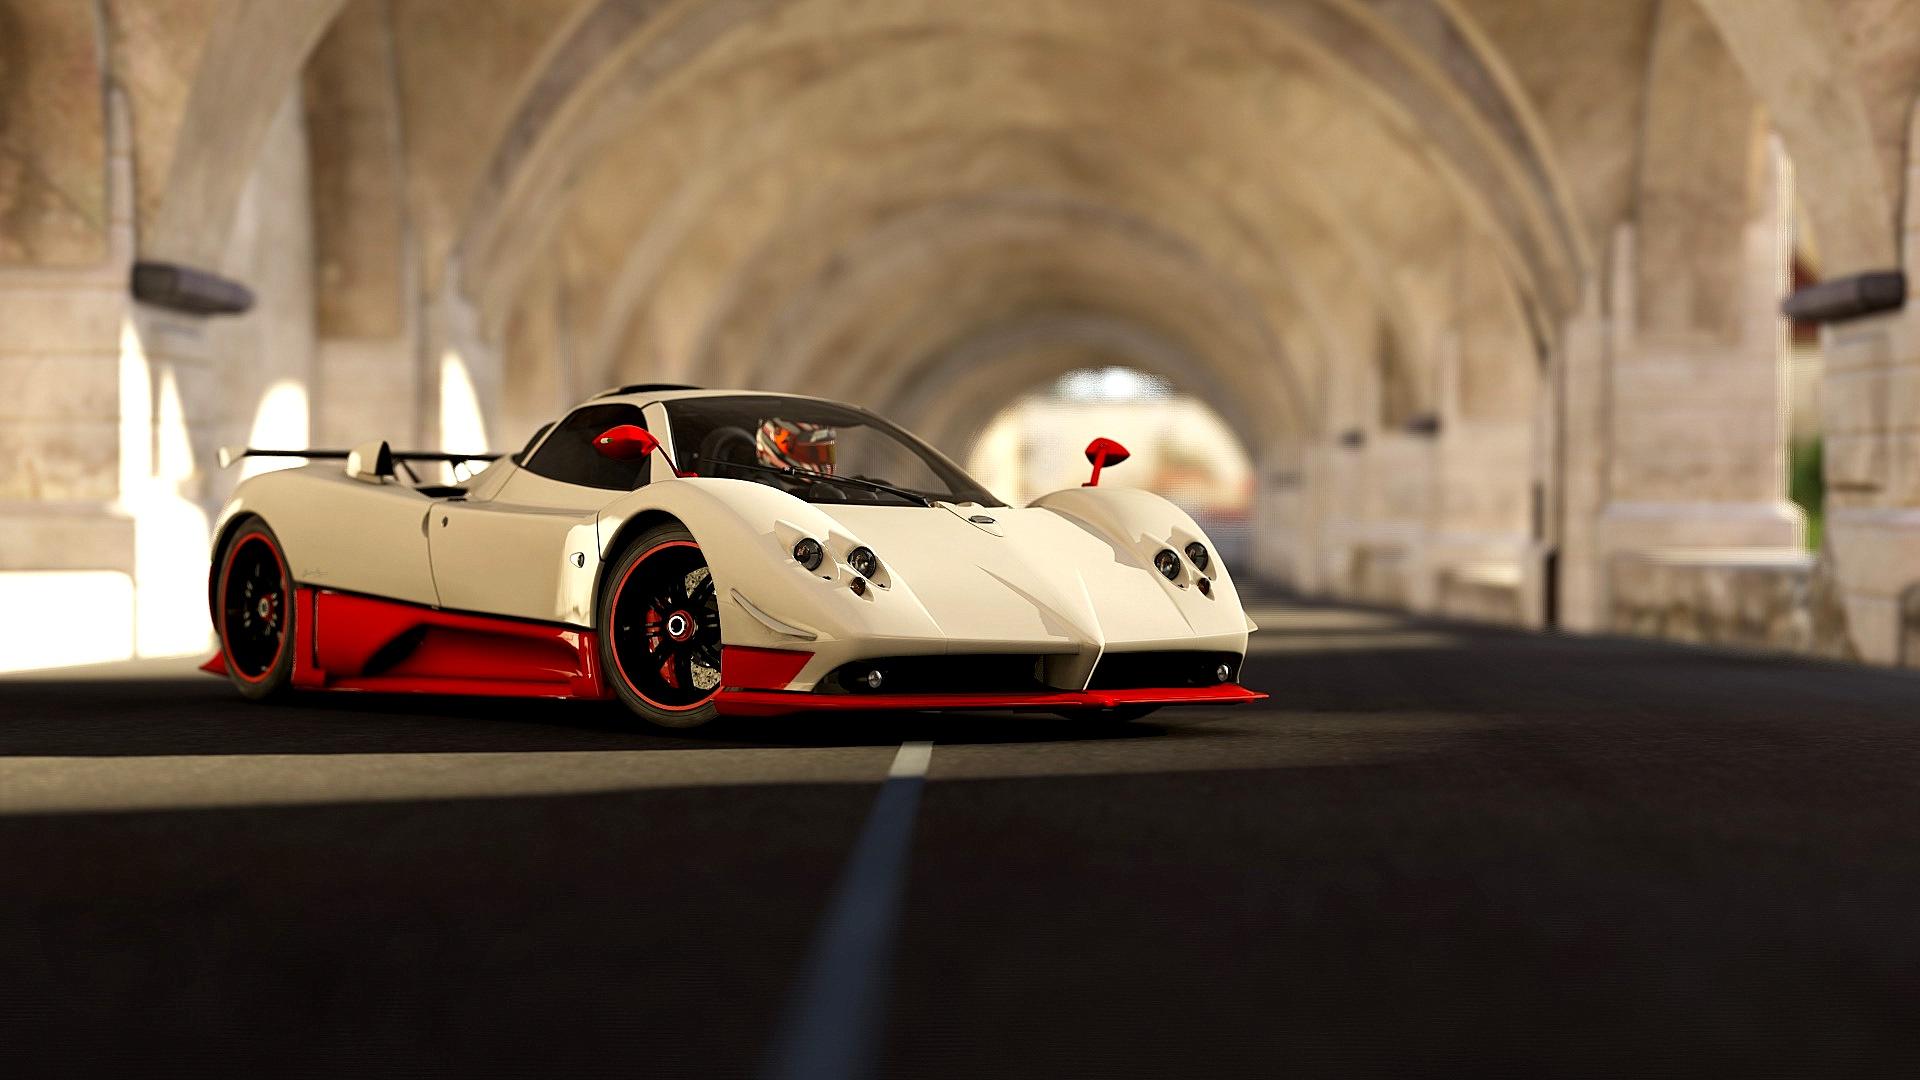 Car Vehicle Sports Car Race Car Supercar Land Vehicle Automobile Make Automotive Design Luxury Vehicle Pagani Public Domain